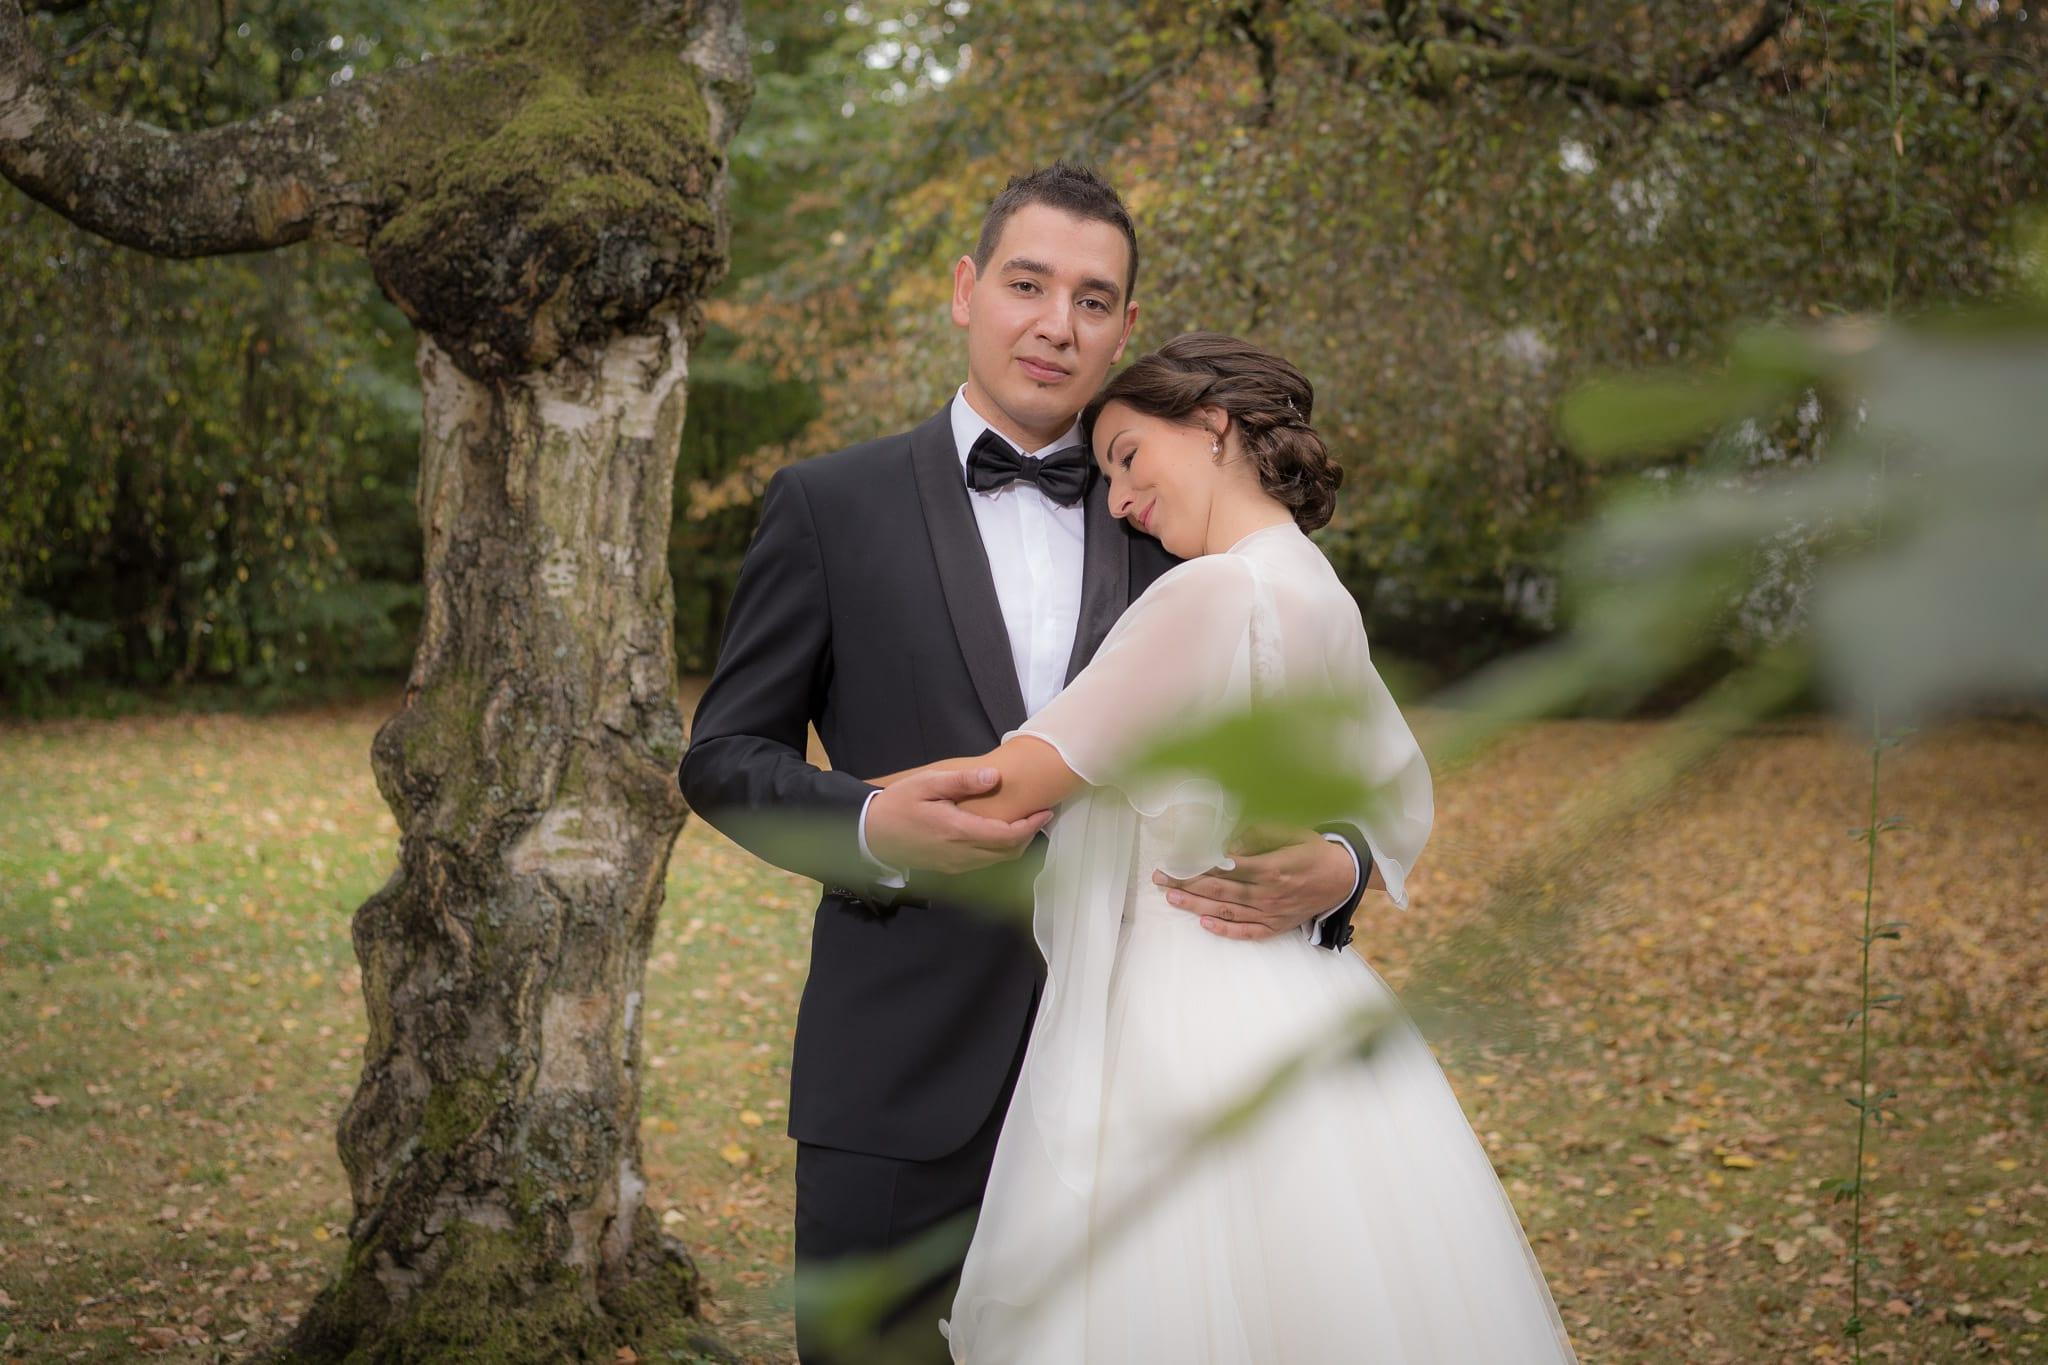 Brautpaar Shooting Porträt